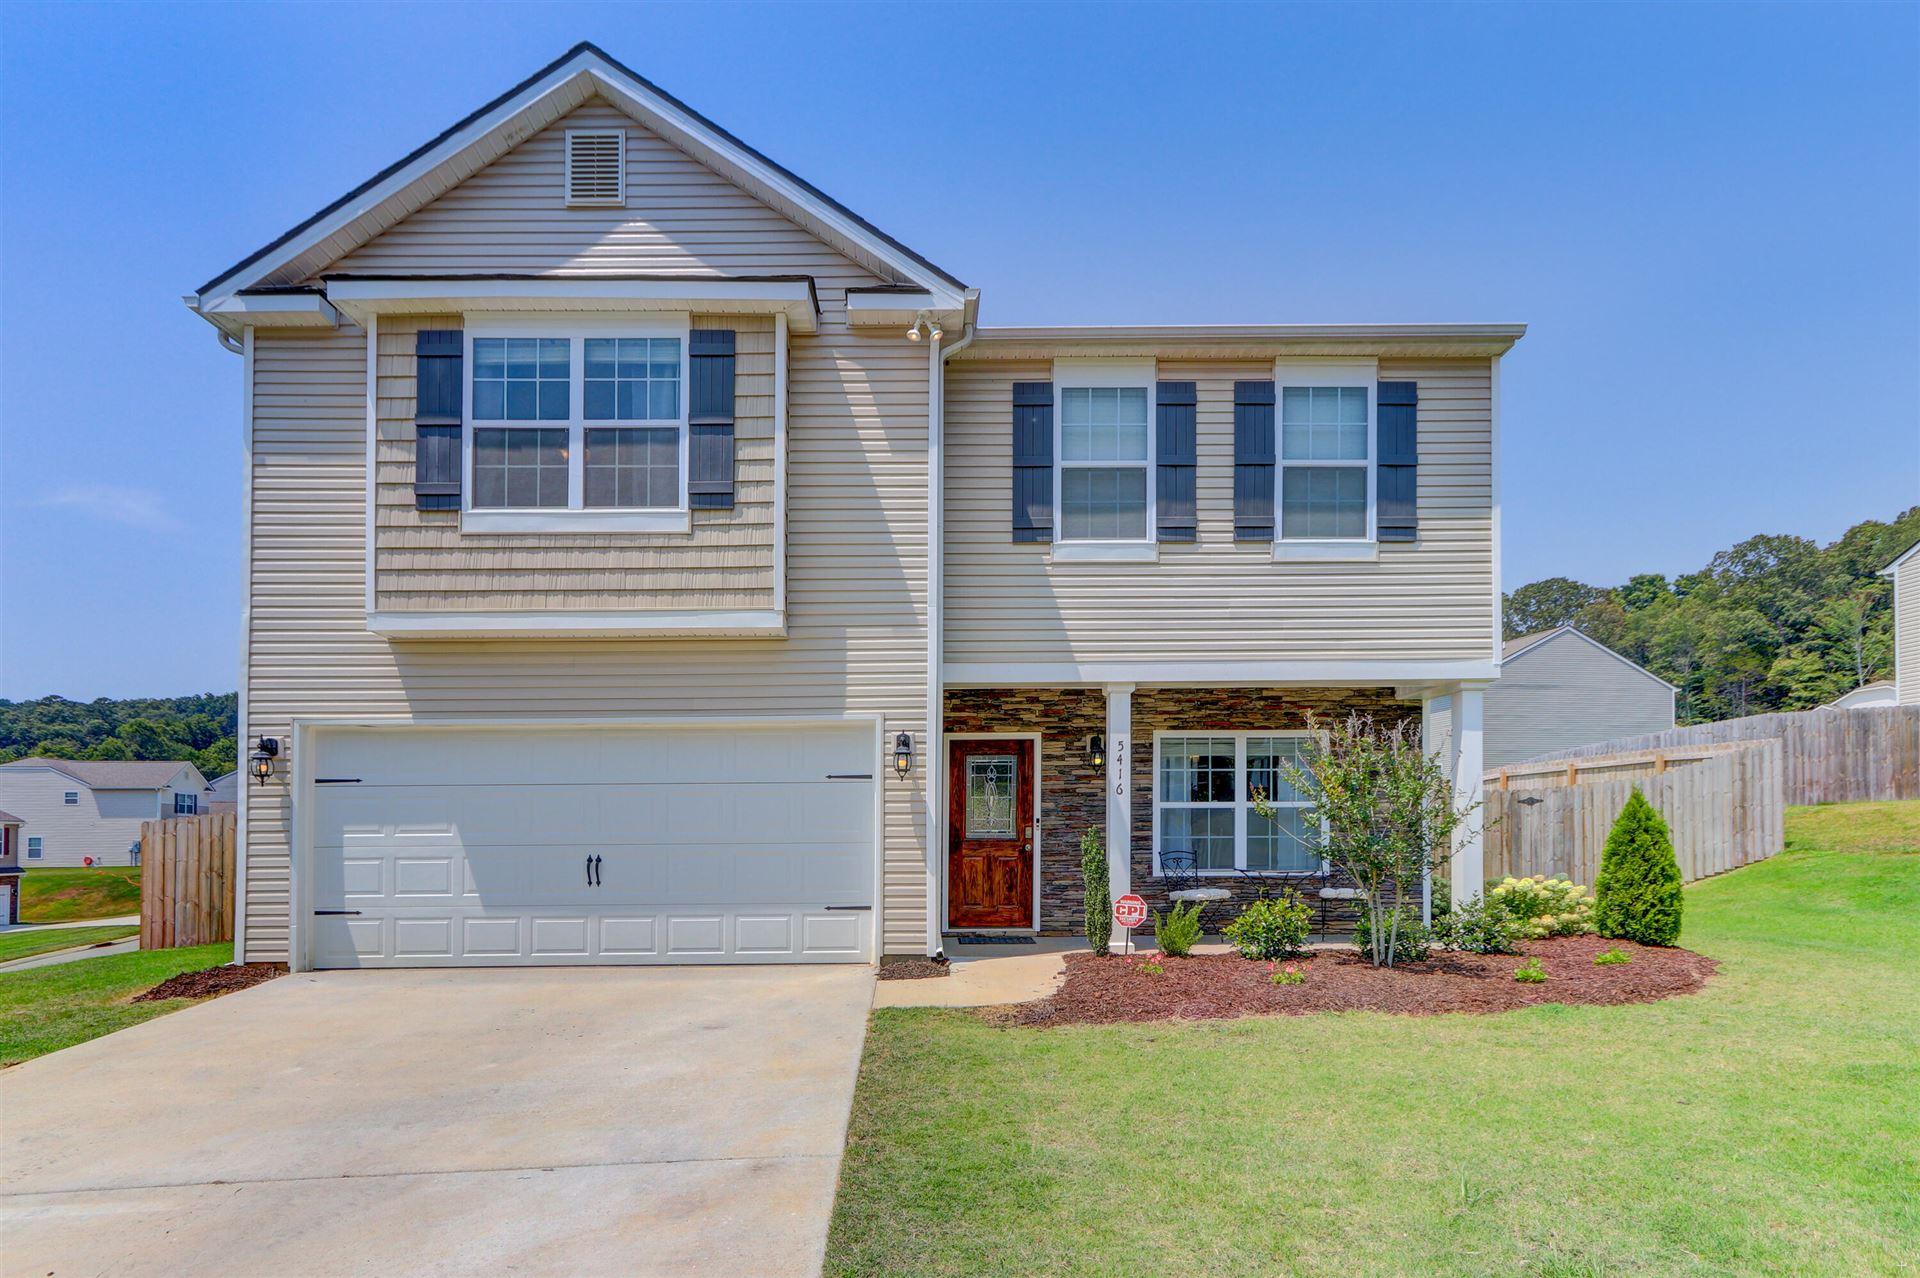 Photo of 5416 Calvert Lane, Knoxville, TN 37918 (MLS # 1162271)